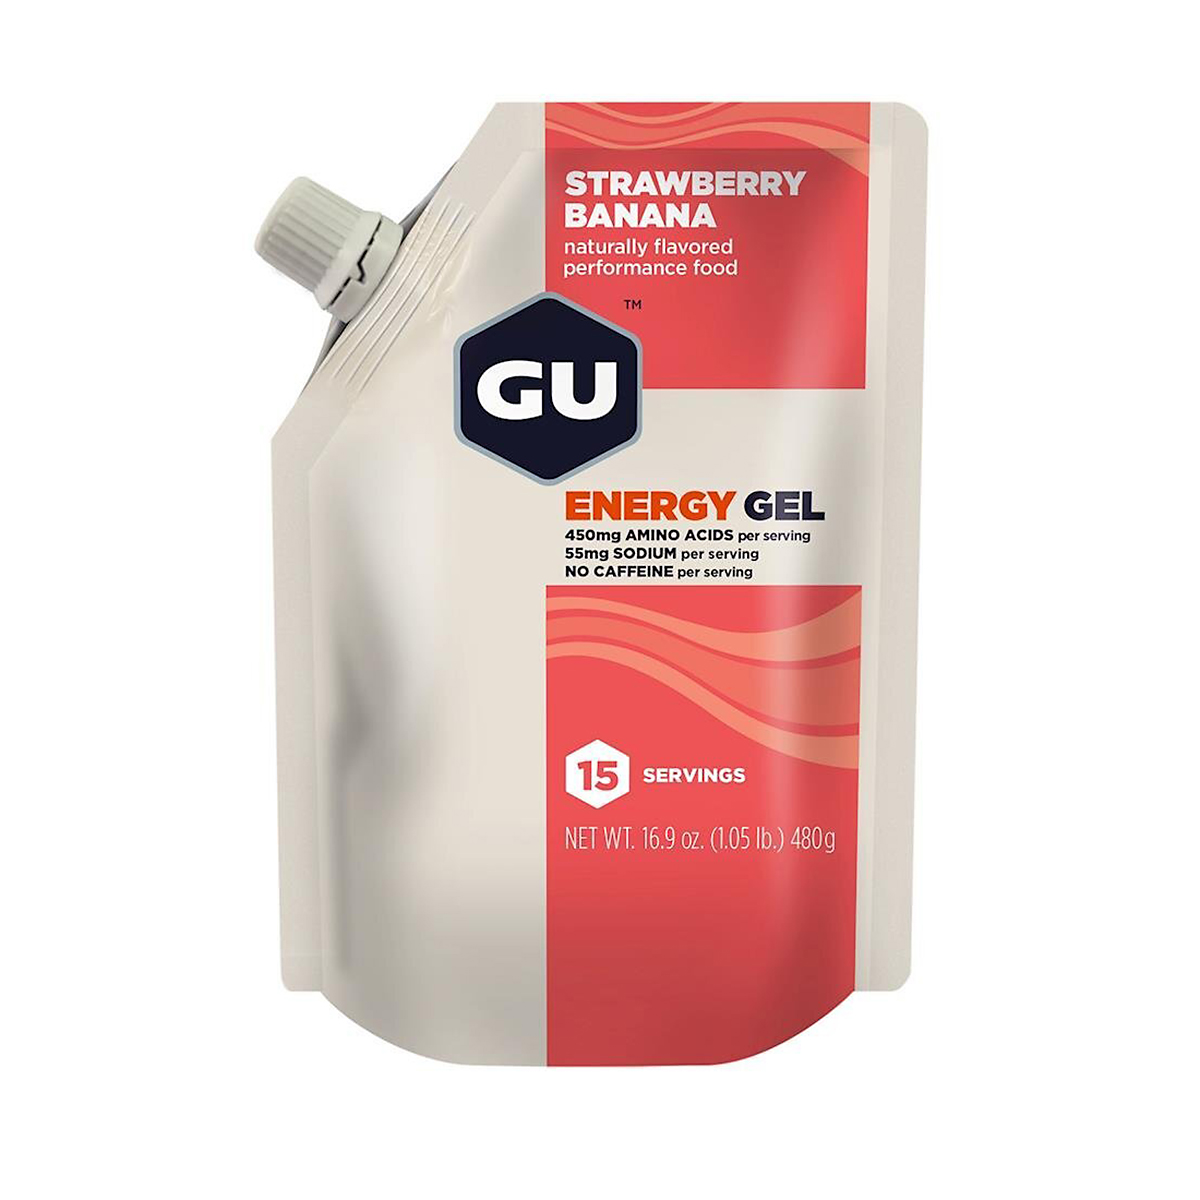 Gu Energy Gel Bulk Pack - Color: Strawberry Banana - Size: 15 Servings, Strawberry Banana, large, image 1